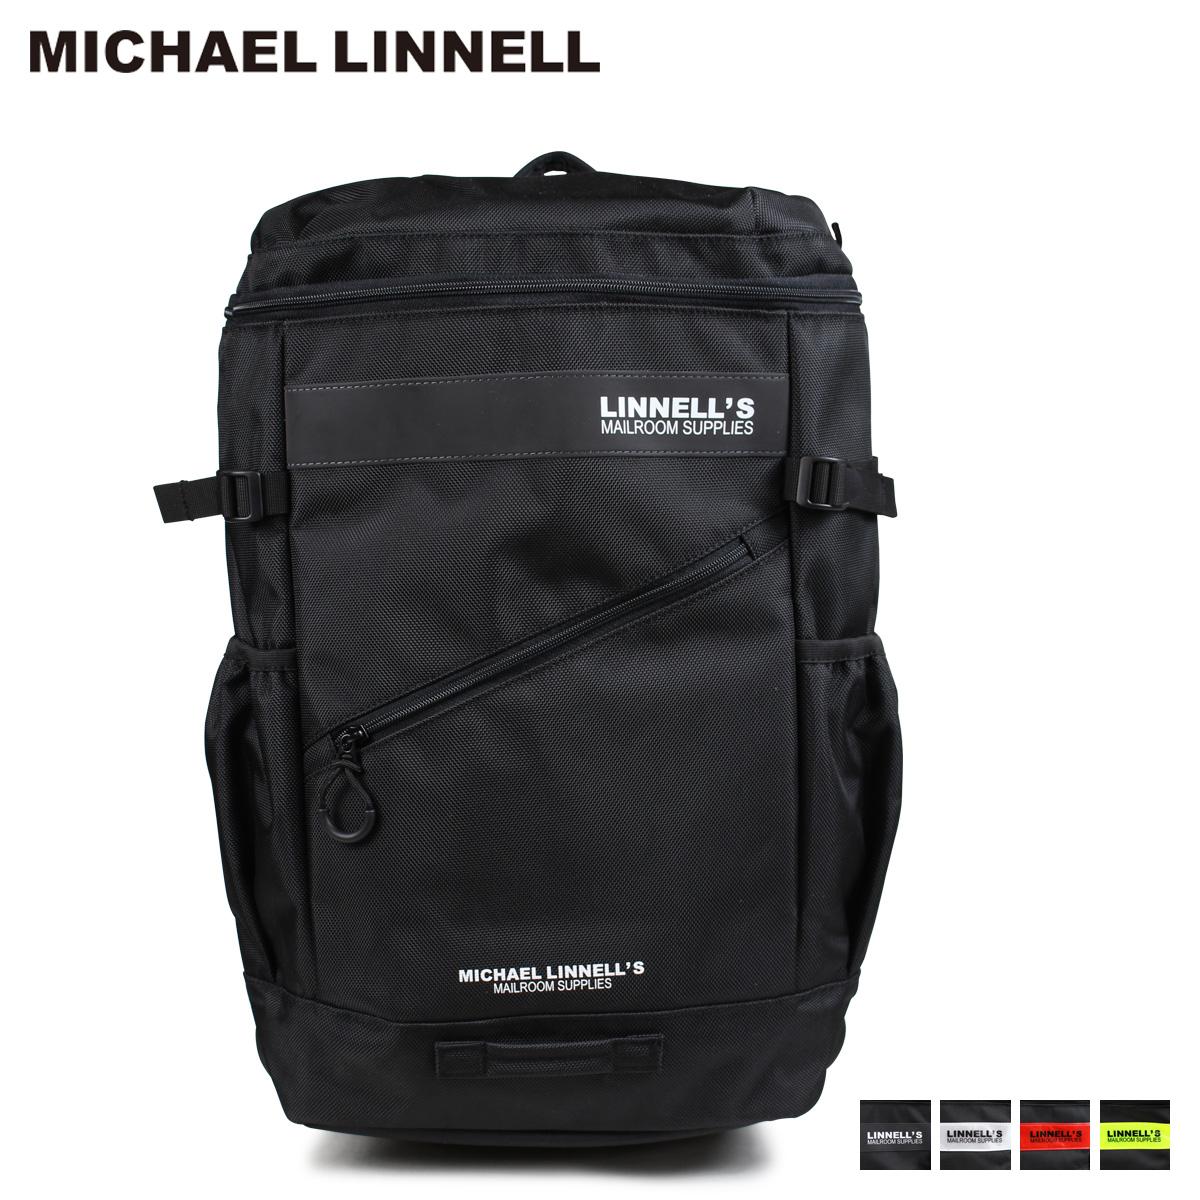 MICHAEL LINNELL マイケルリンネル リュック バッグ 32L メンズ レディース バックパック BOX BACKPACK ML-020 [10/19 新入荷]